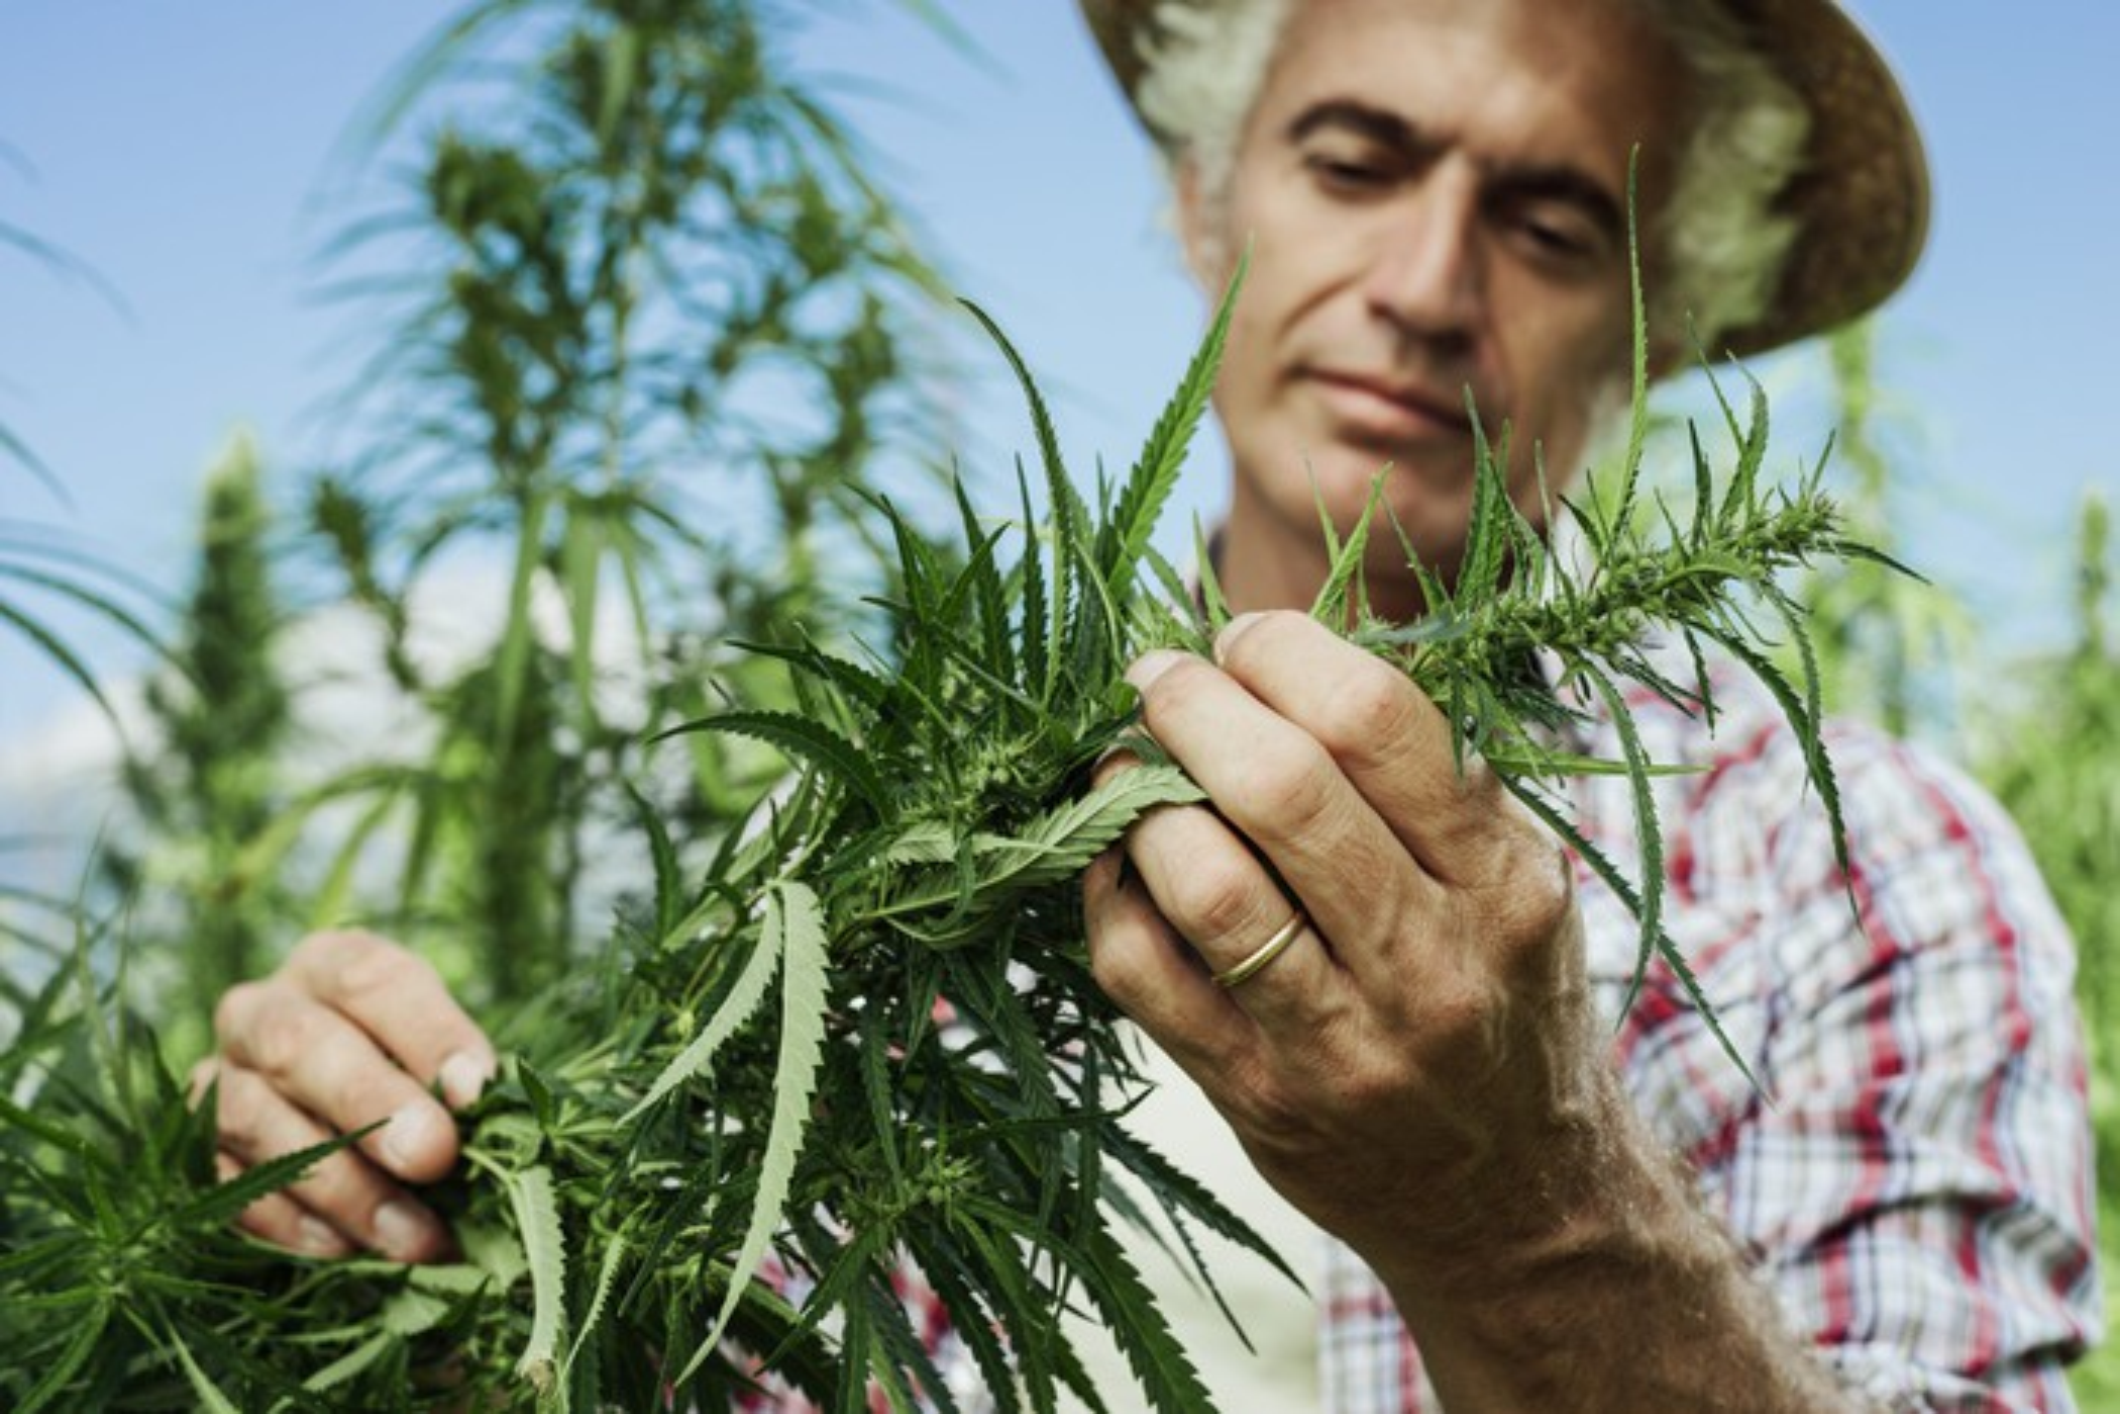 A hemp farmer examining and pruning a hemp plant.